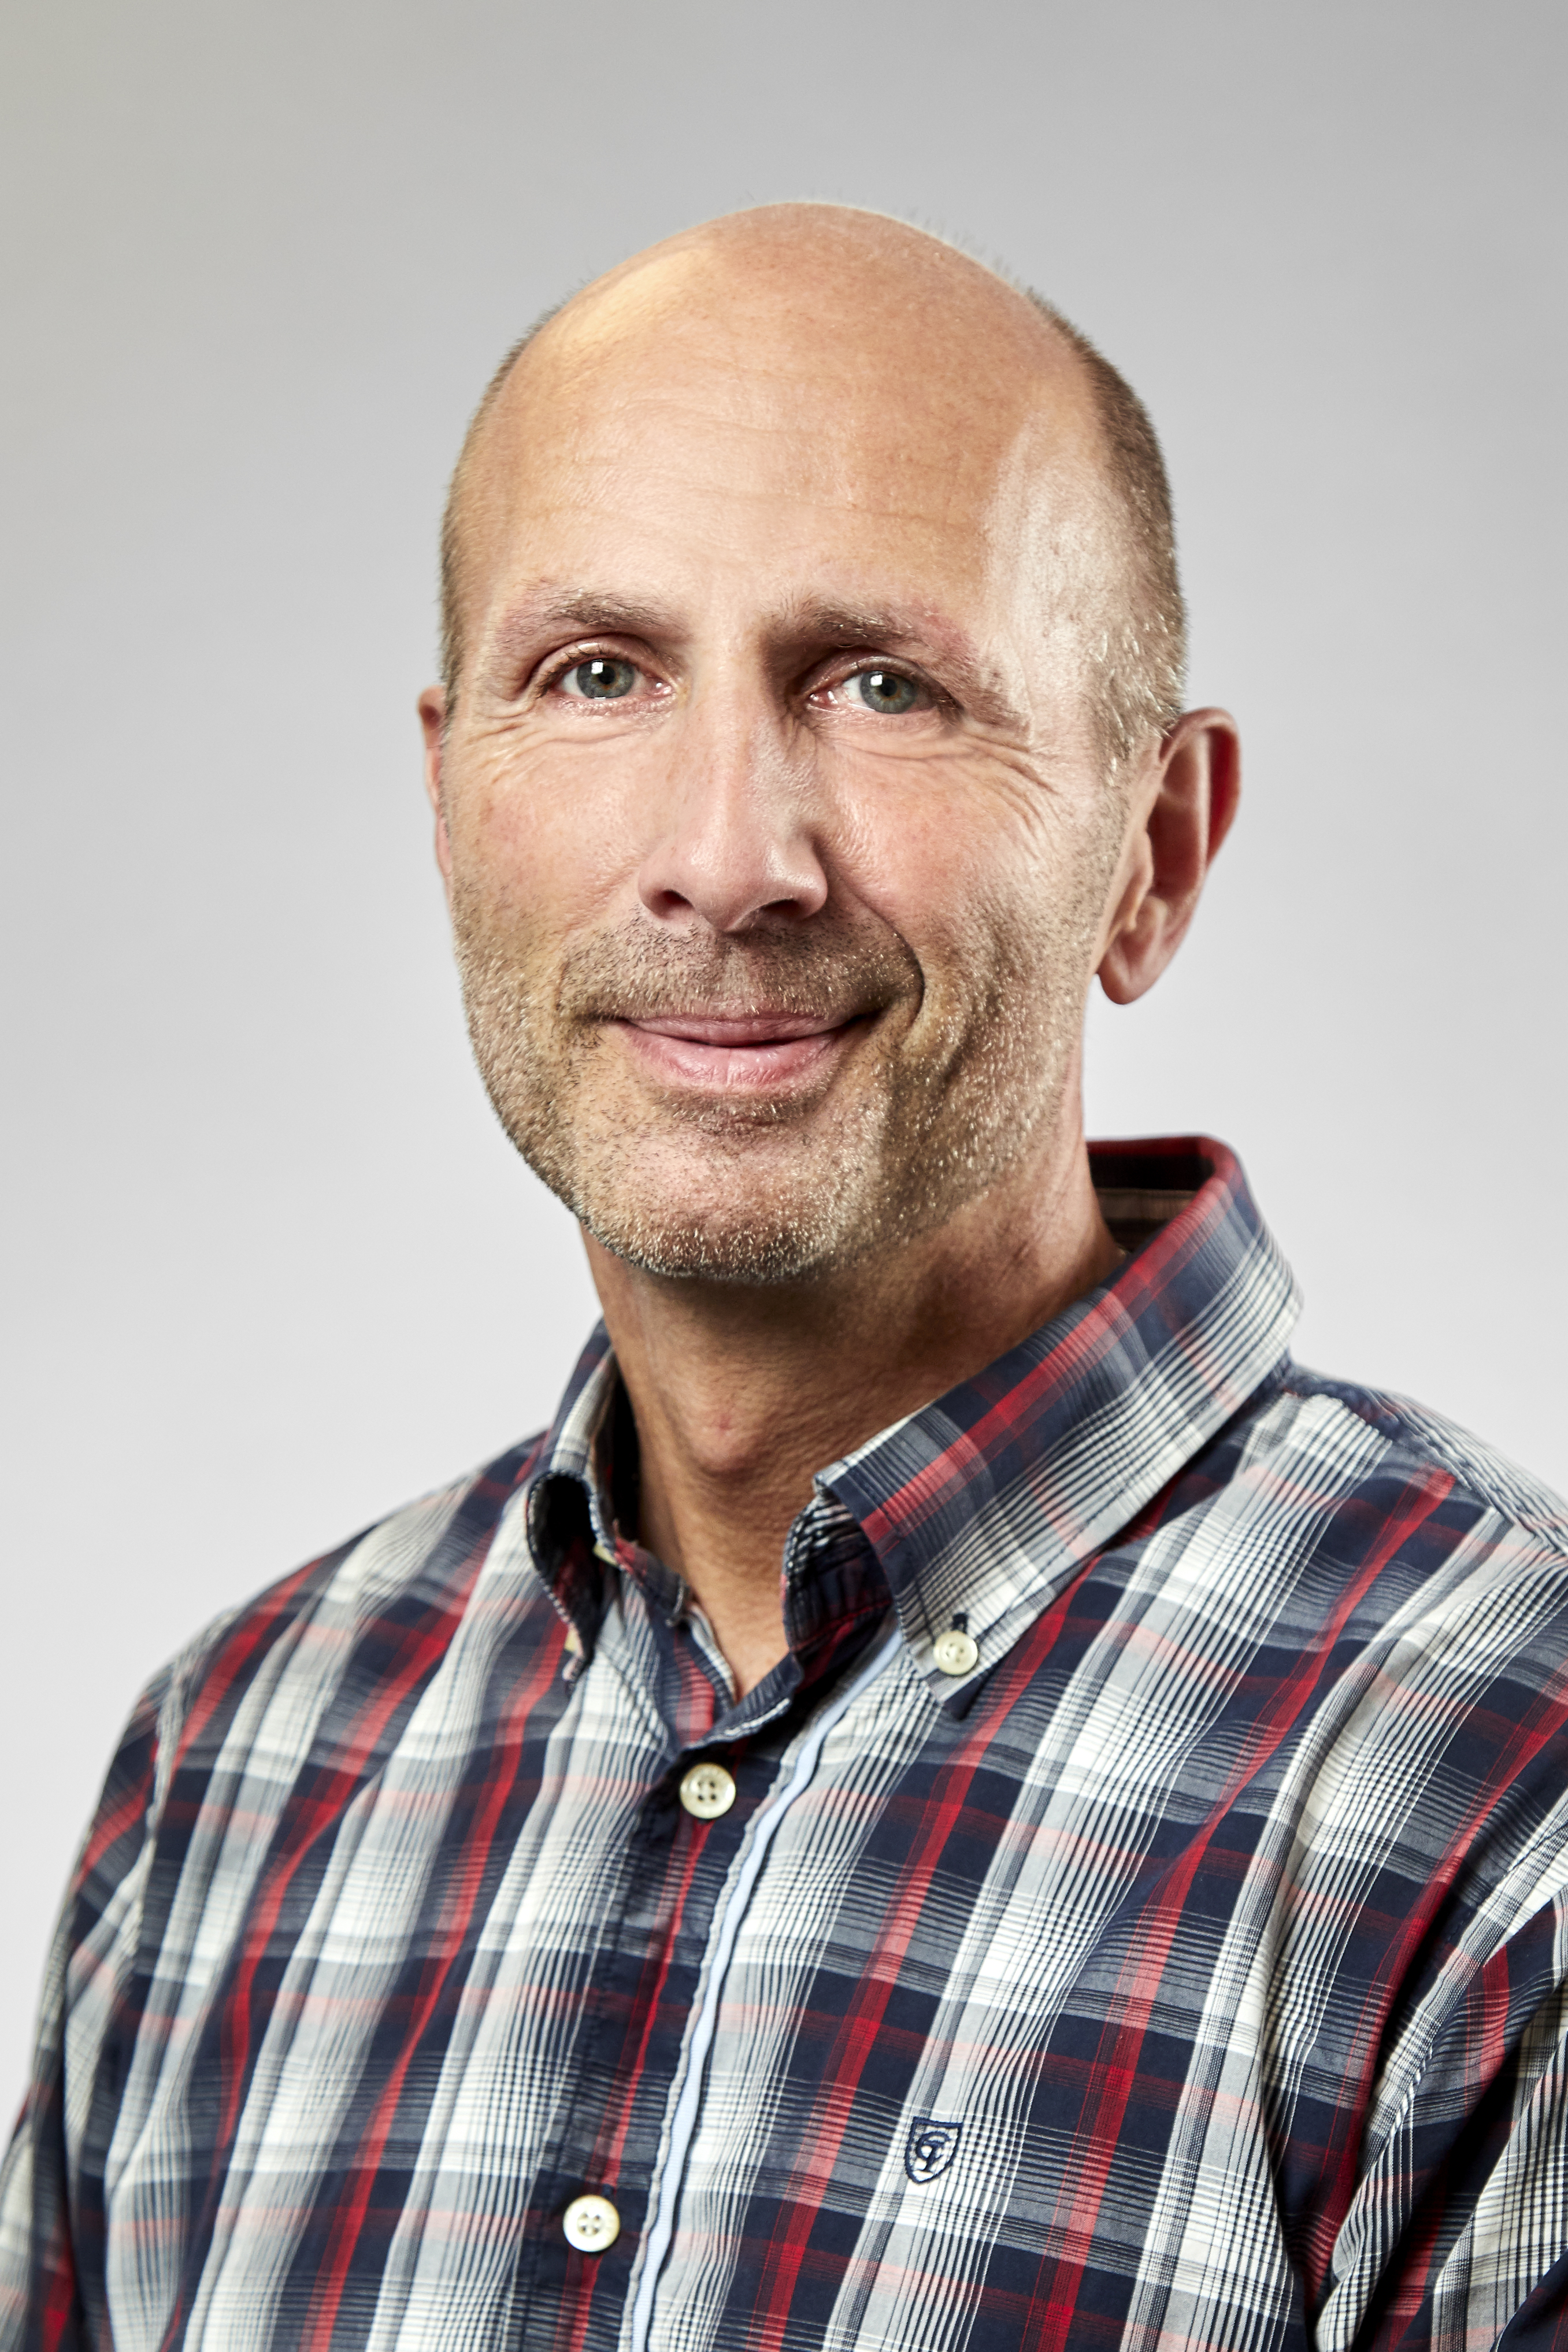 Jesper Hovgaard